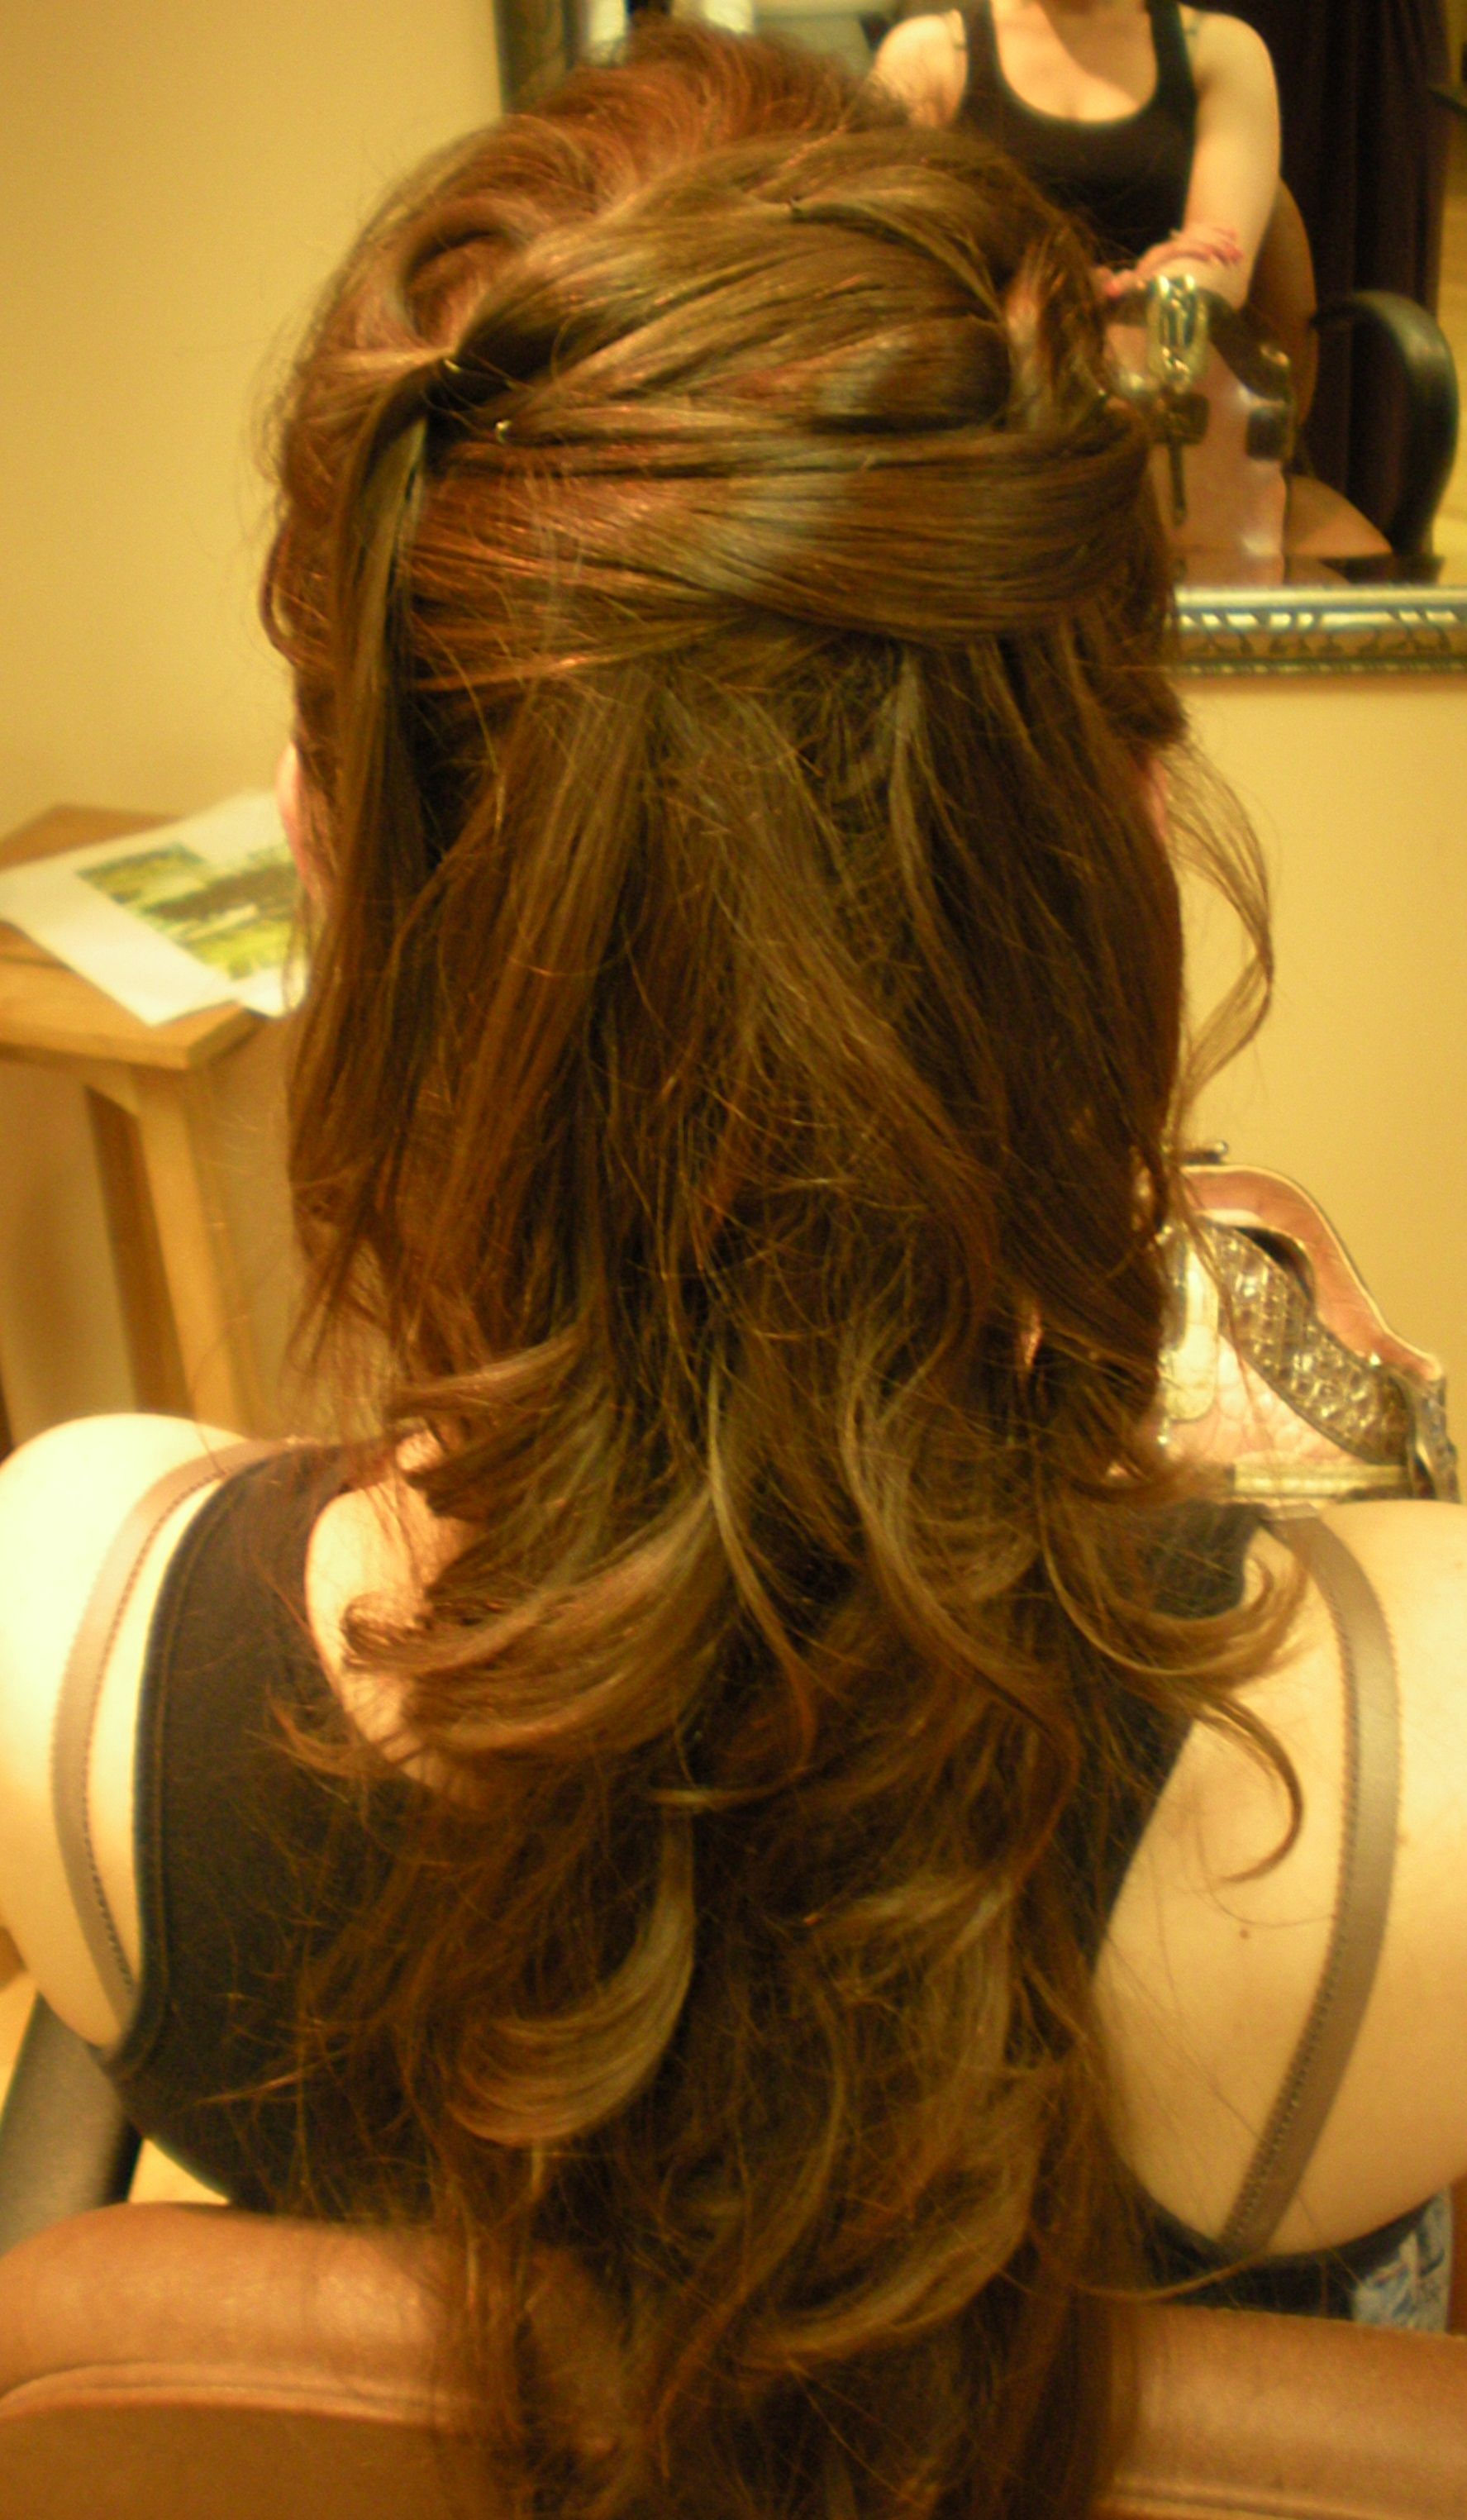 My wedding hair trial at adagio in syracuse ny half up half down